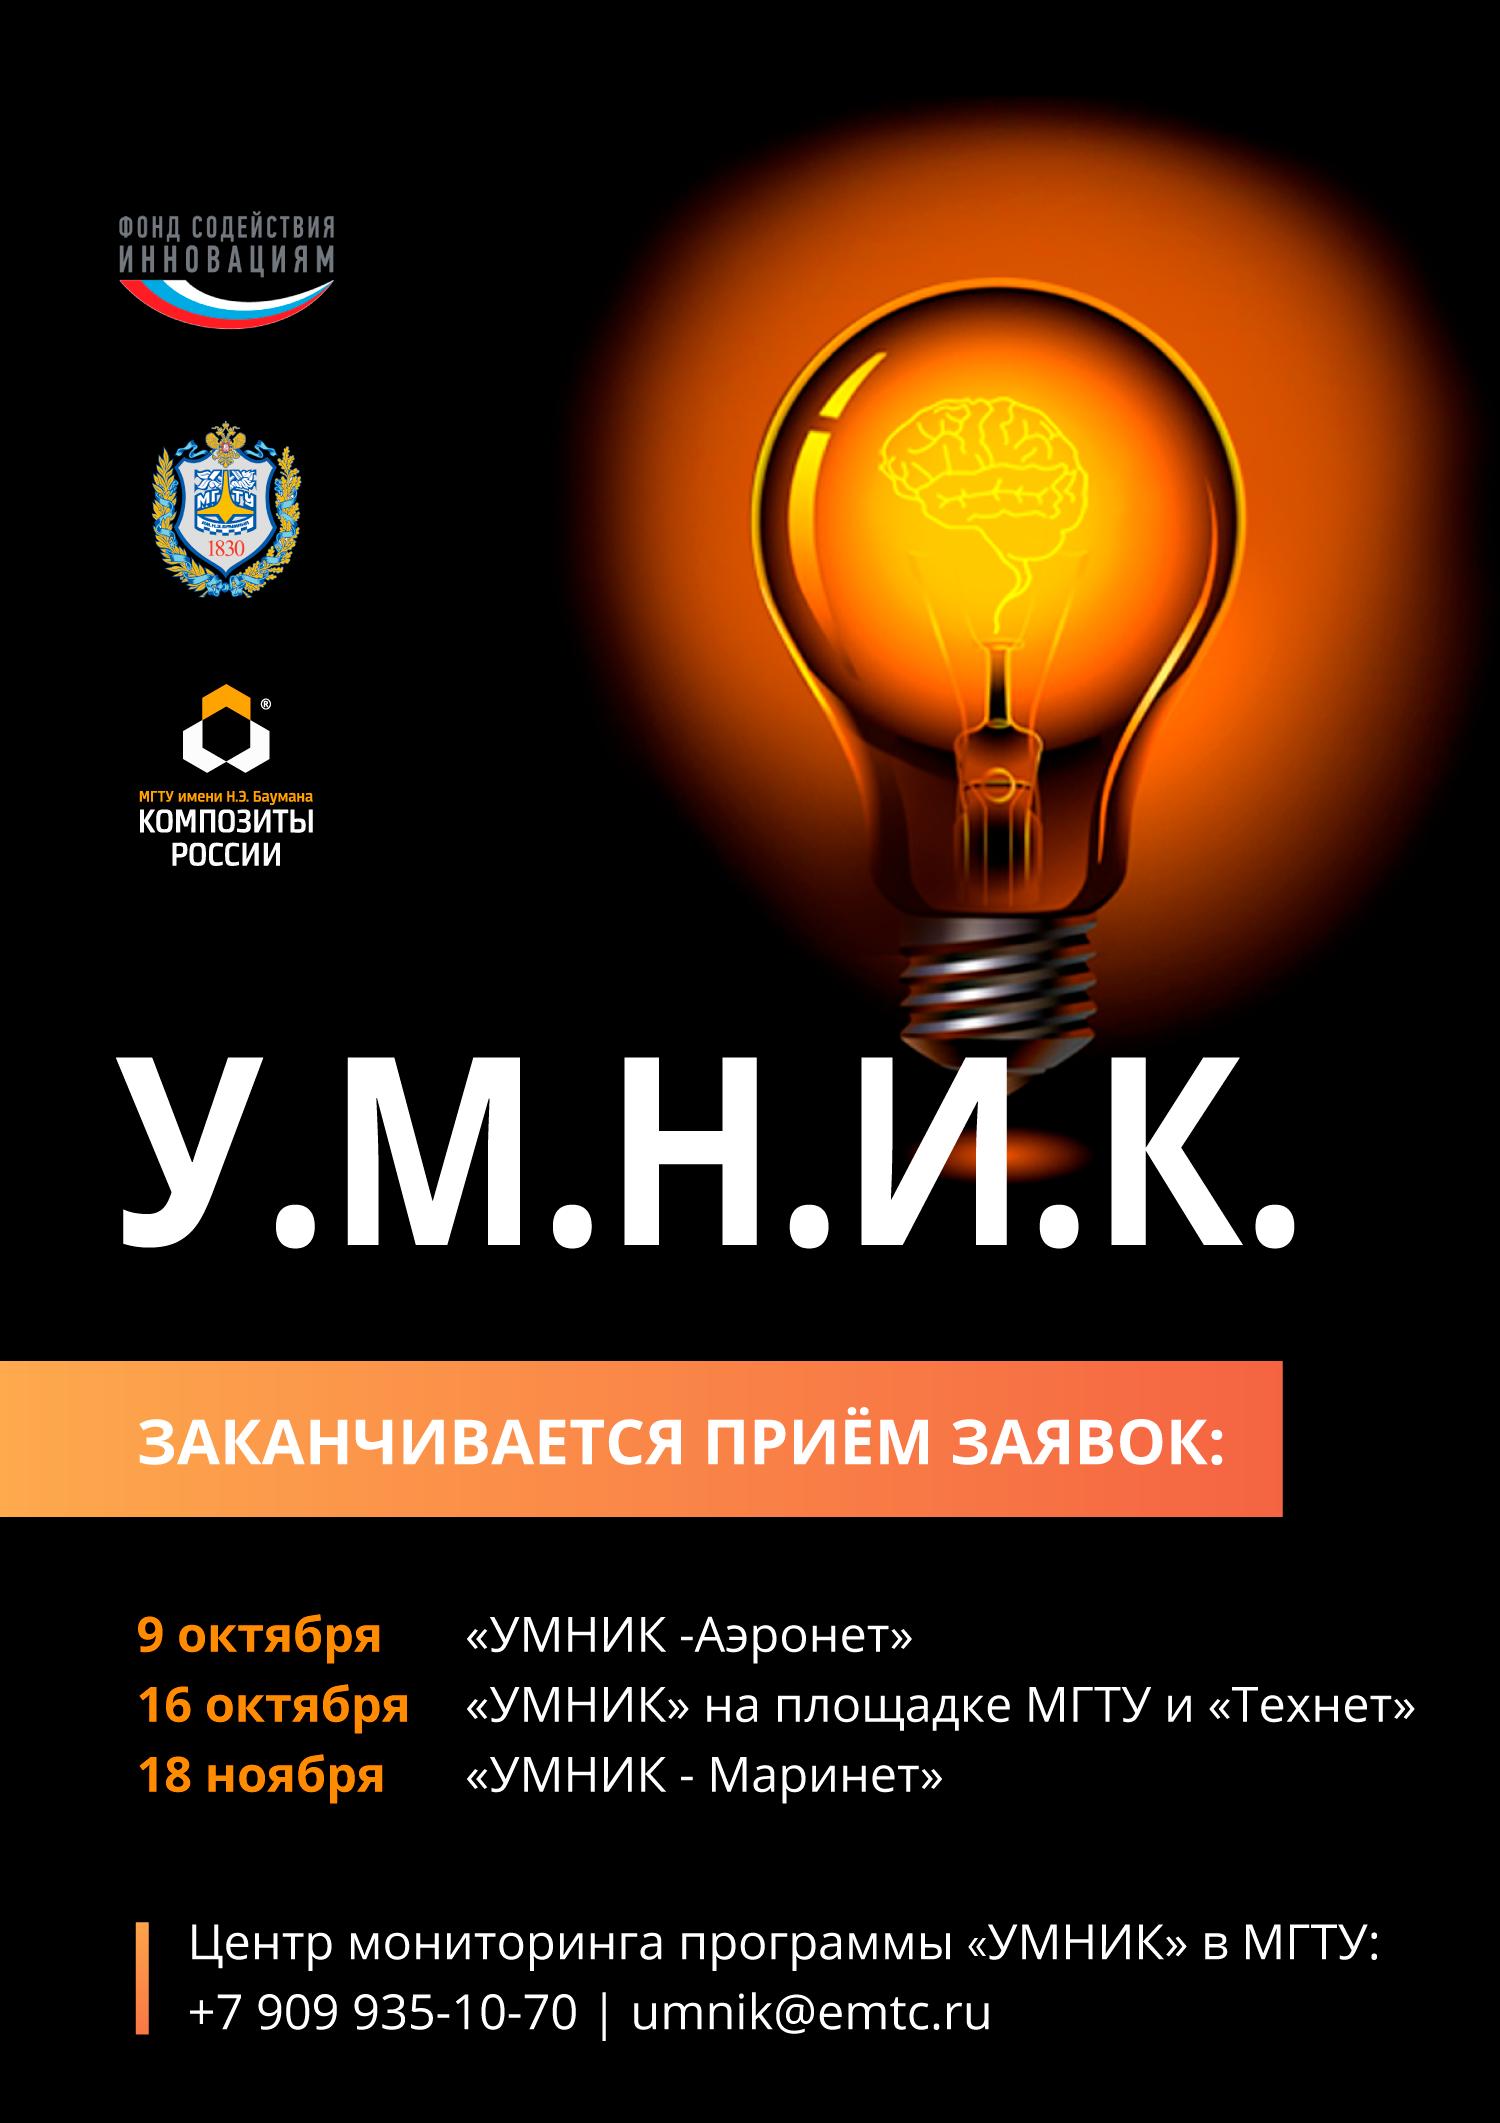 umnik-2018-2019-priem-zayavok-itog